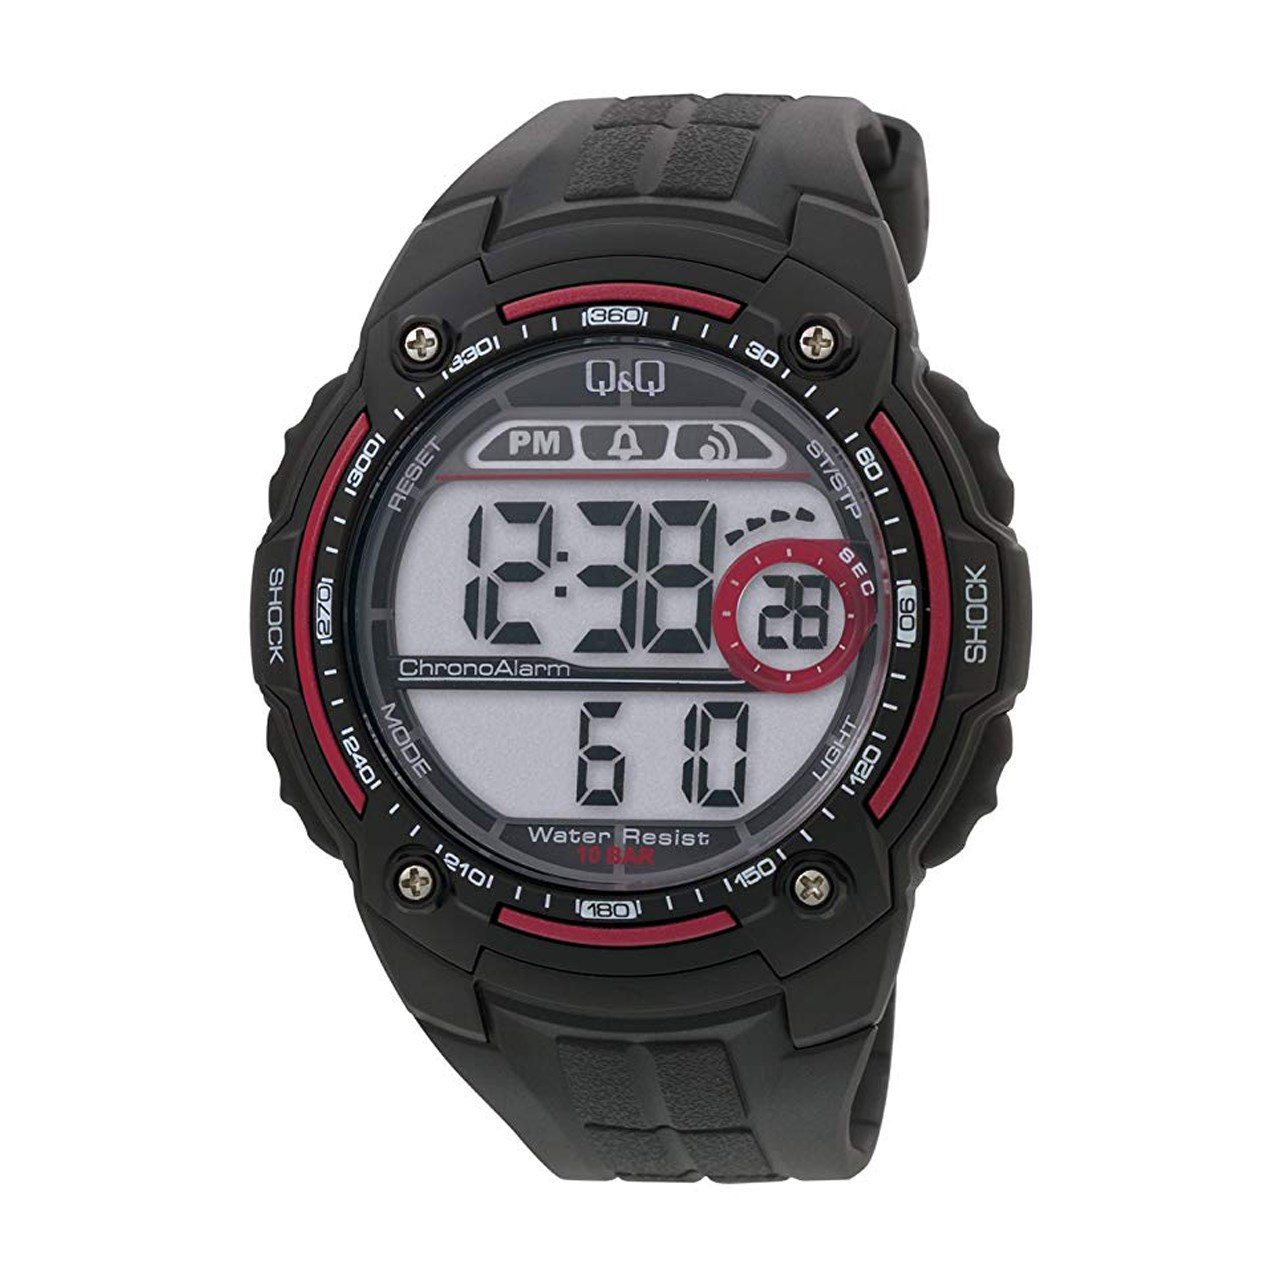 ساعت مچی دیجیتال مردانه کیو اند کیو مدل M075J002Y             قیمت